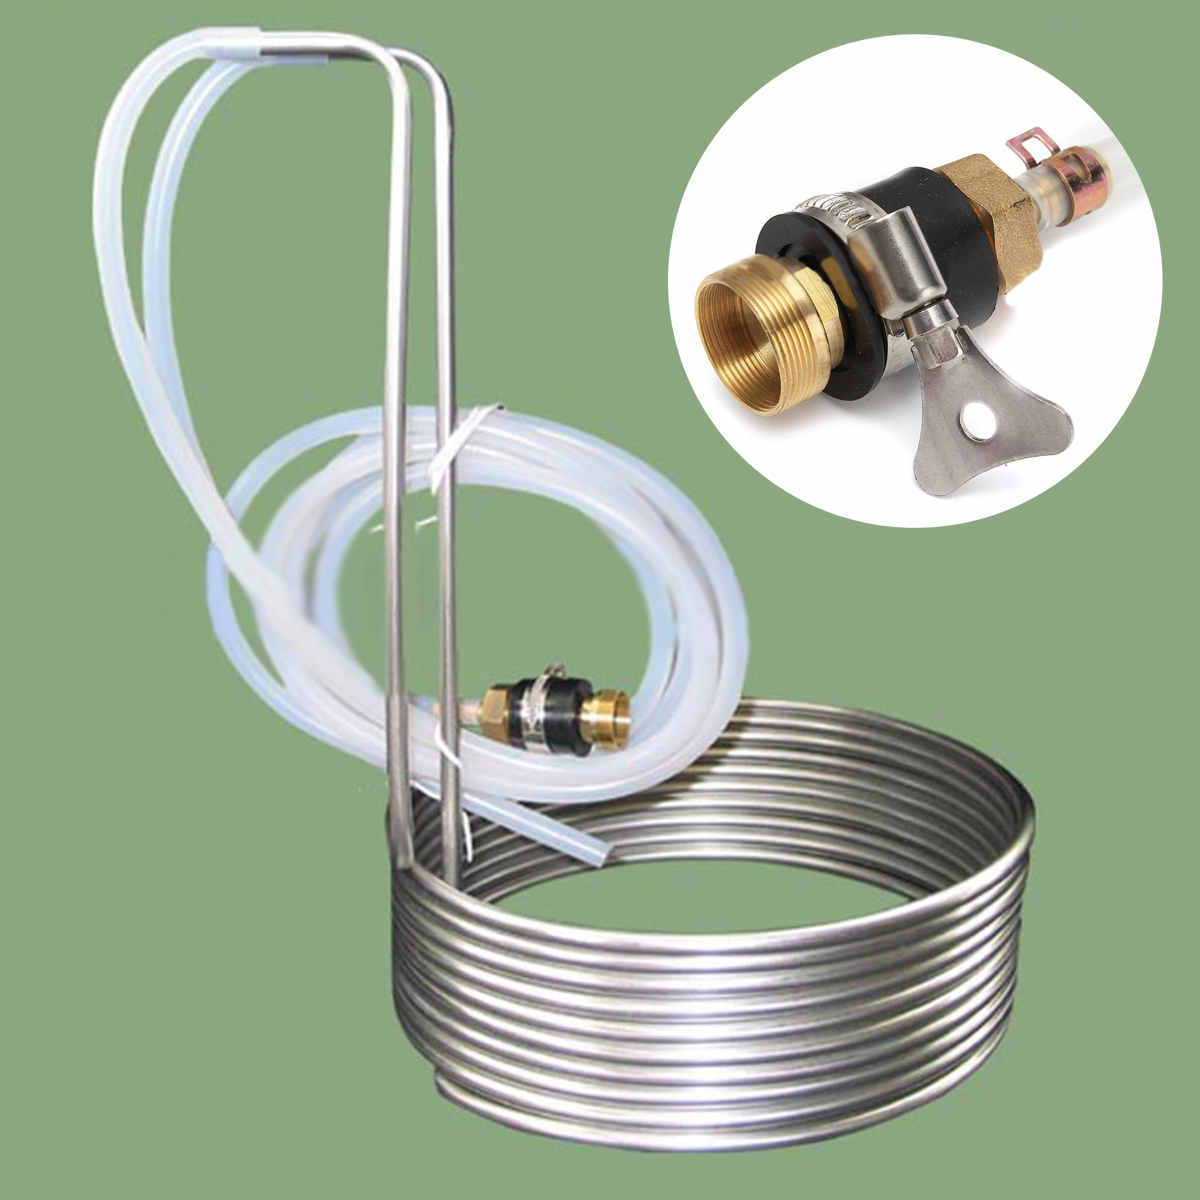 304 Stainless Steel Immersion Wort Chiller Tube Home Brewing Super Efficient Wort Chiller Home Wine Making Machine Part New